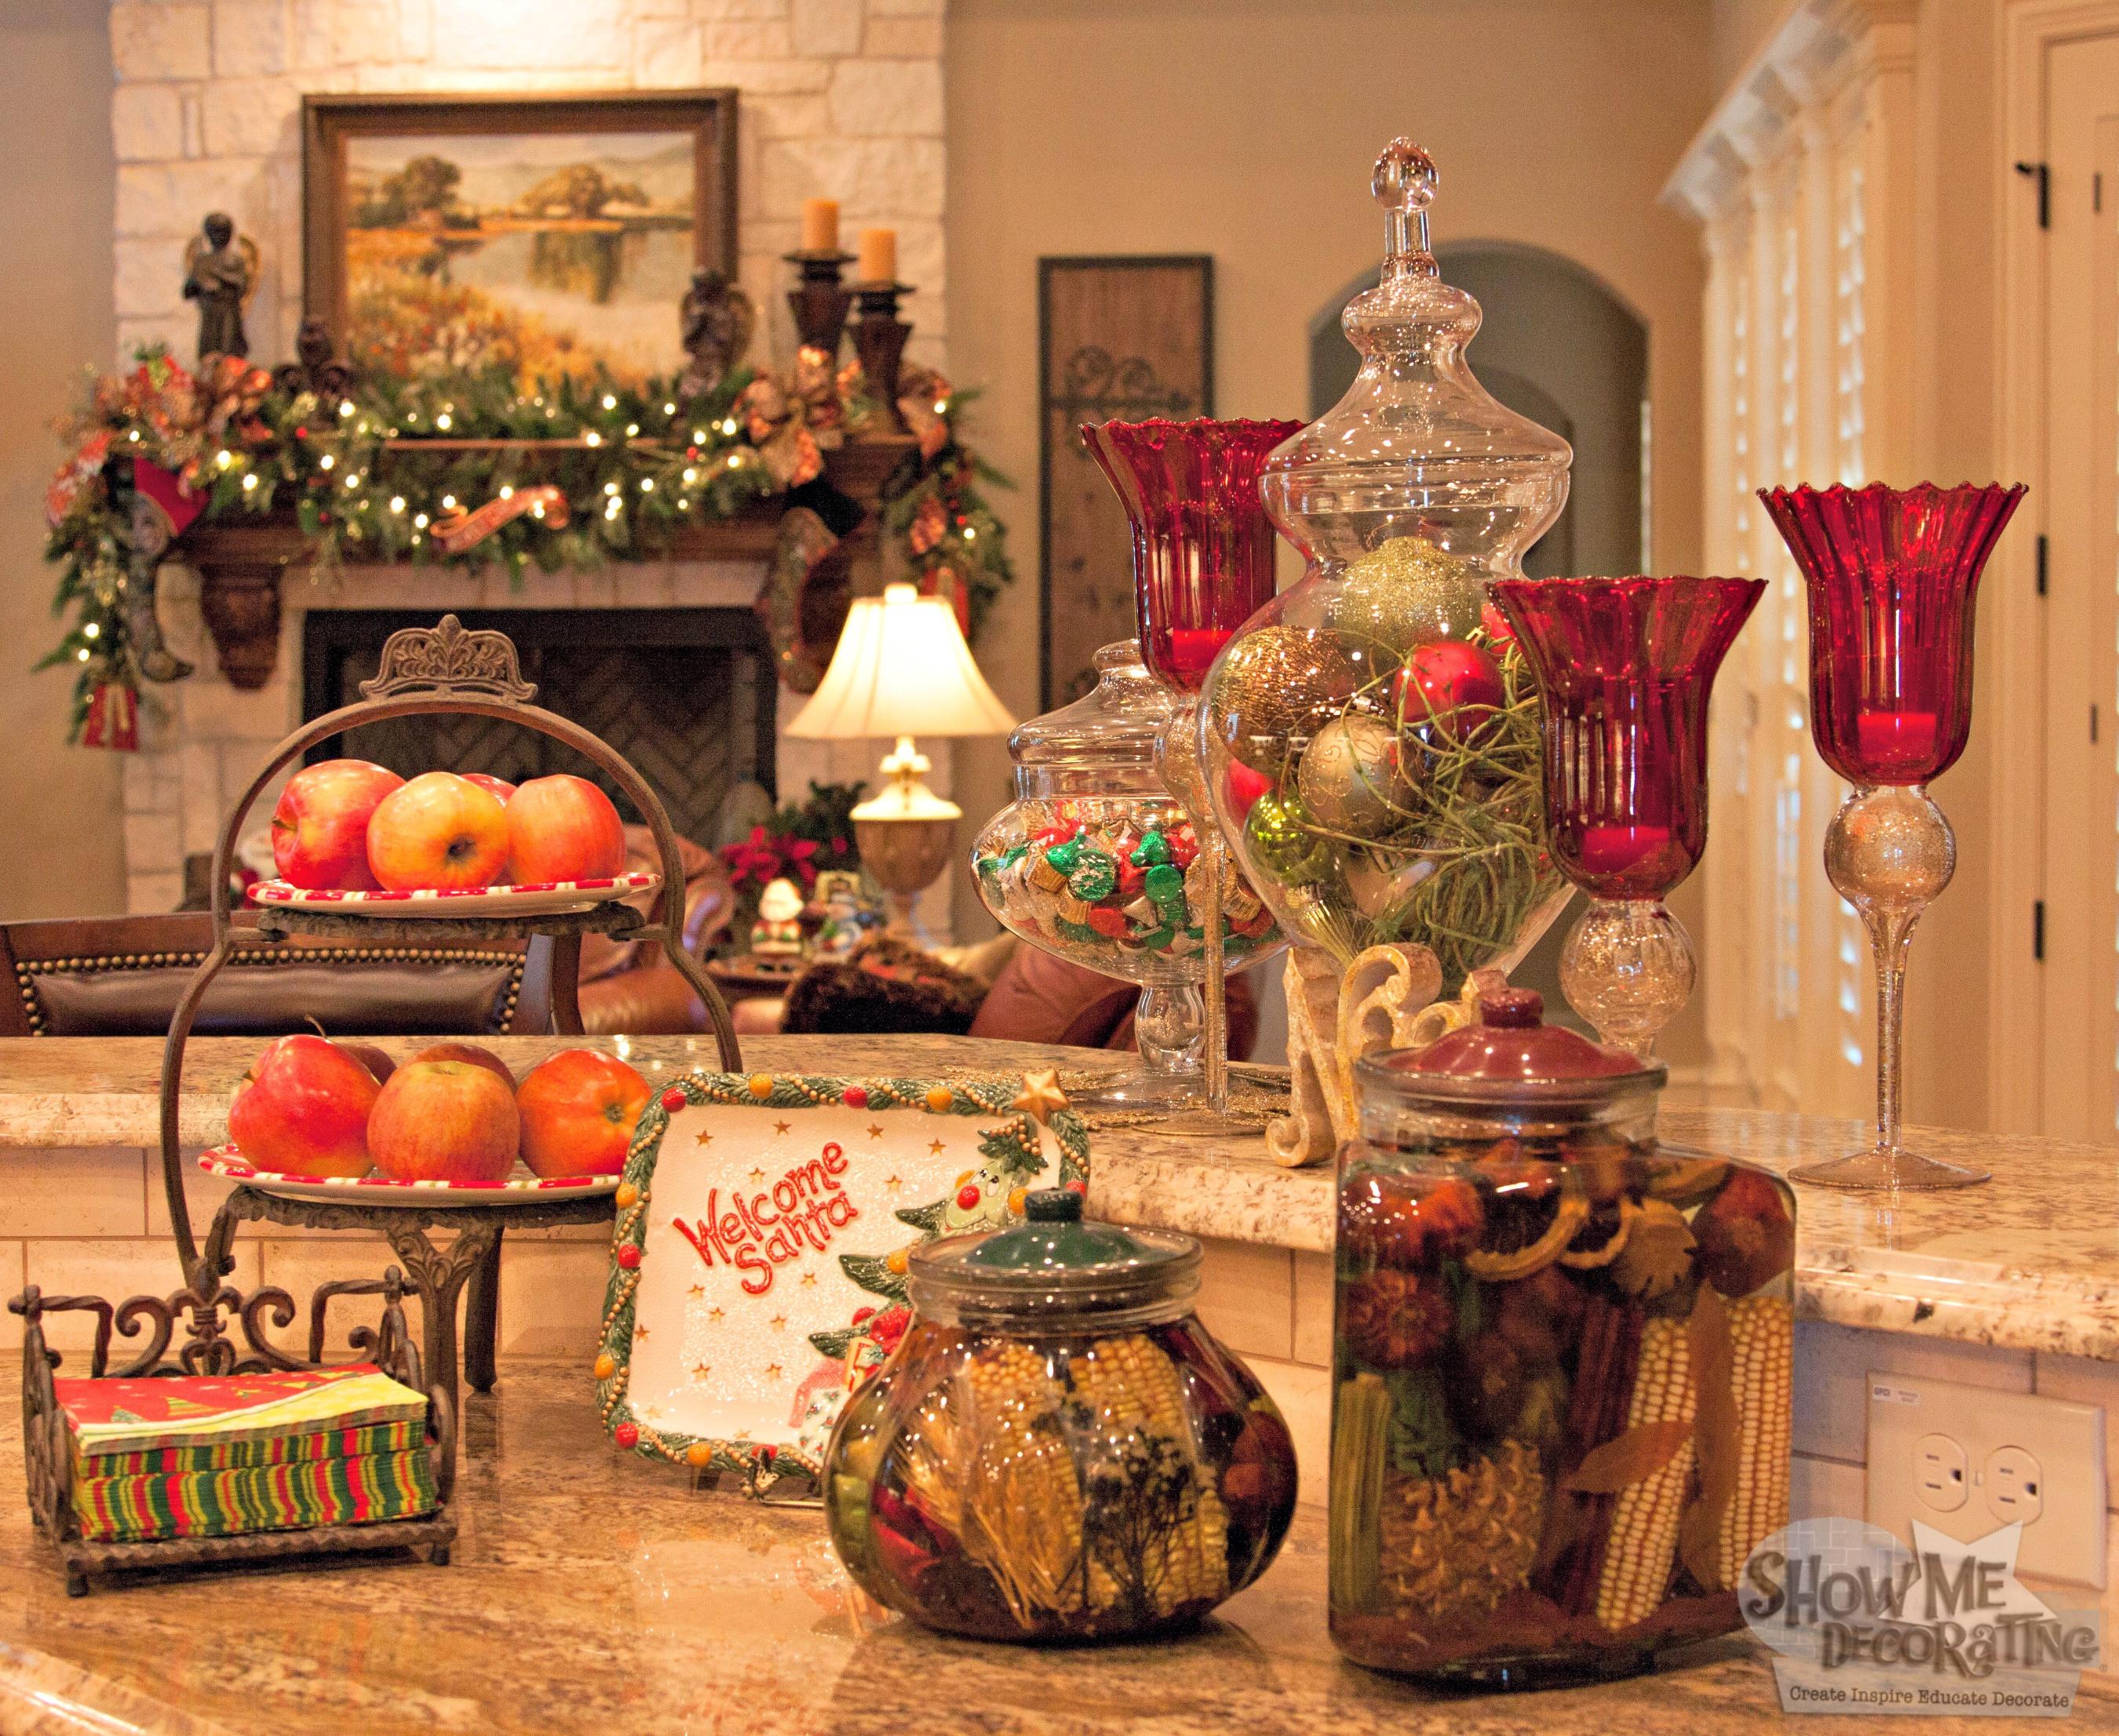 Christmas Kitchen Decor  Show Me Decorating